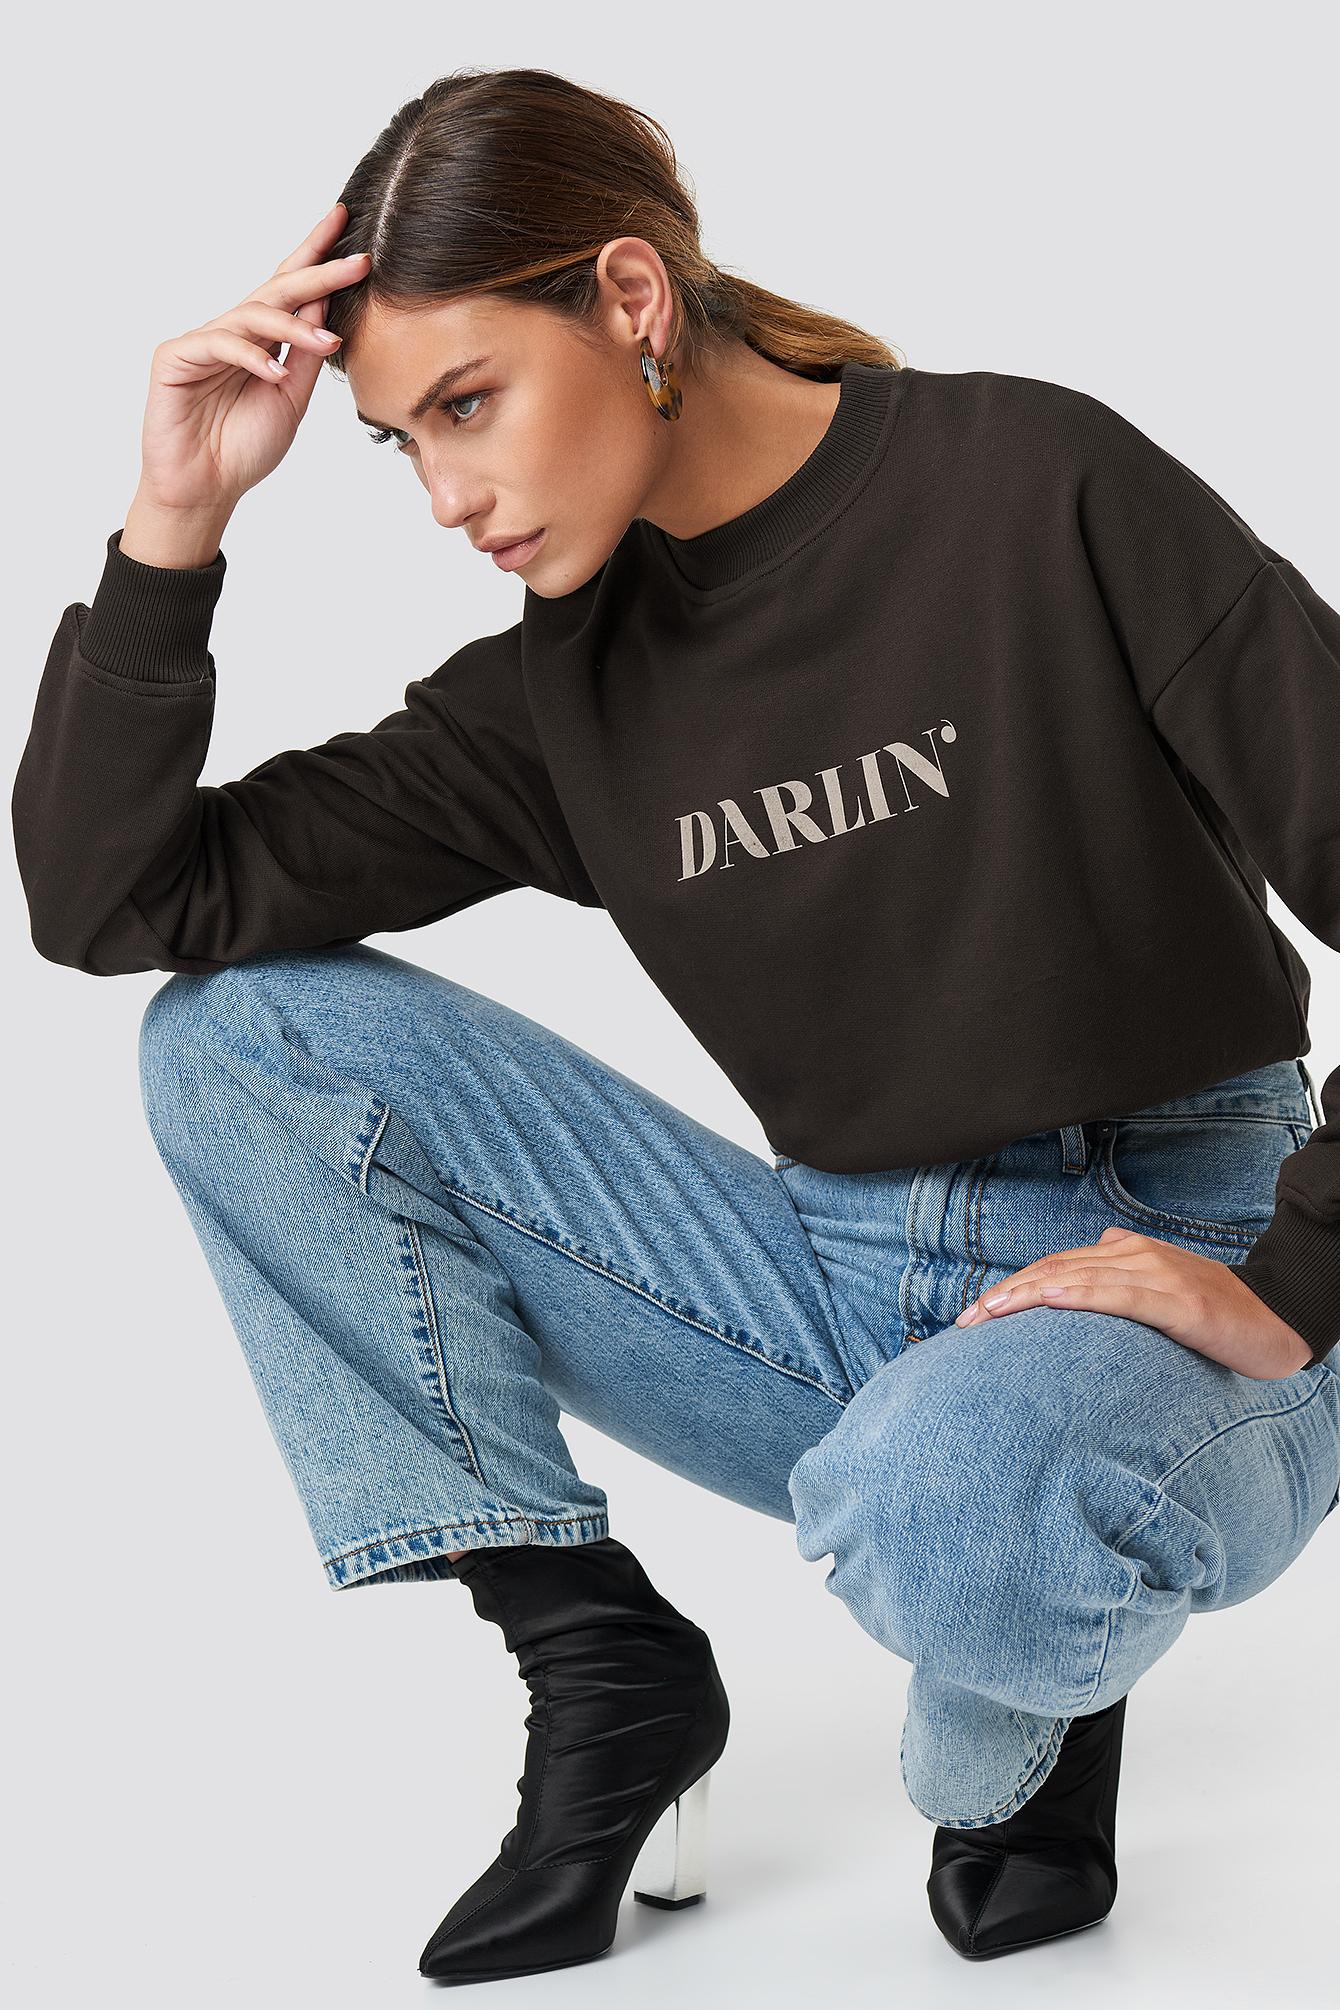 na-kd -  Darlin' Sweatshirt - Brown